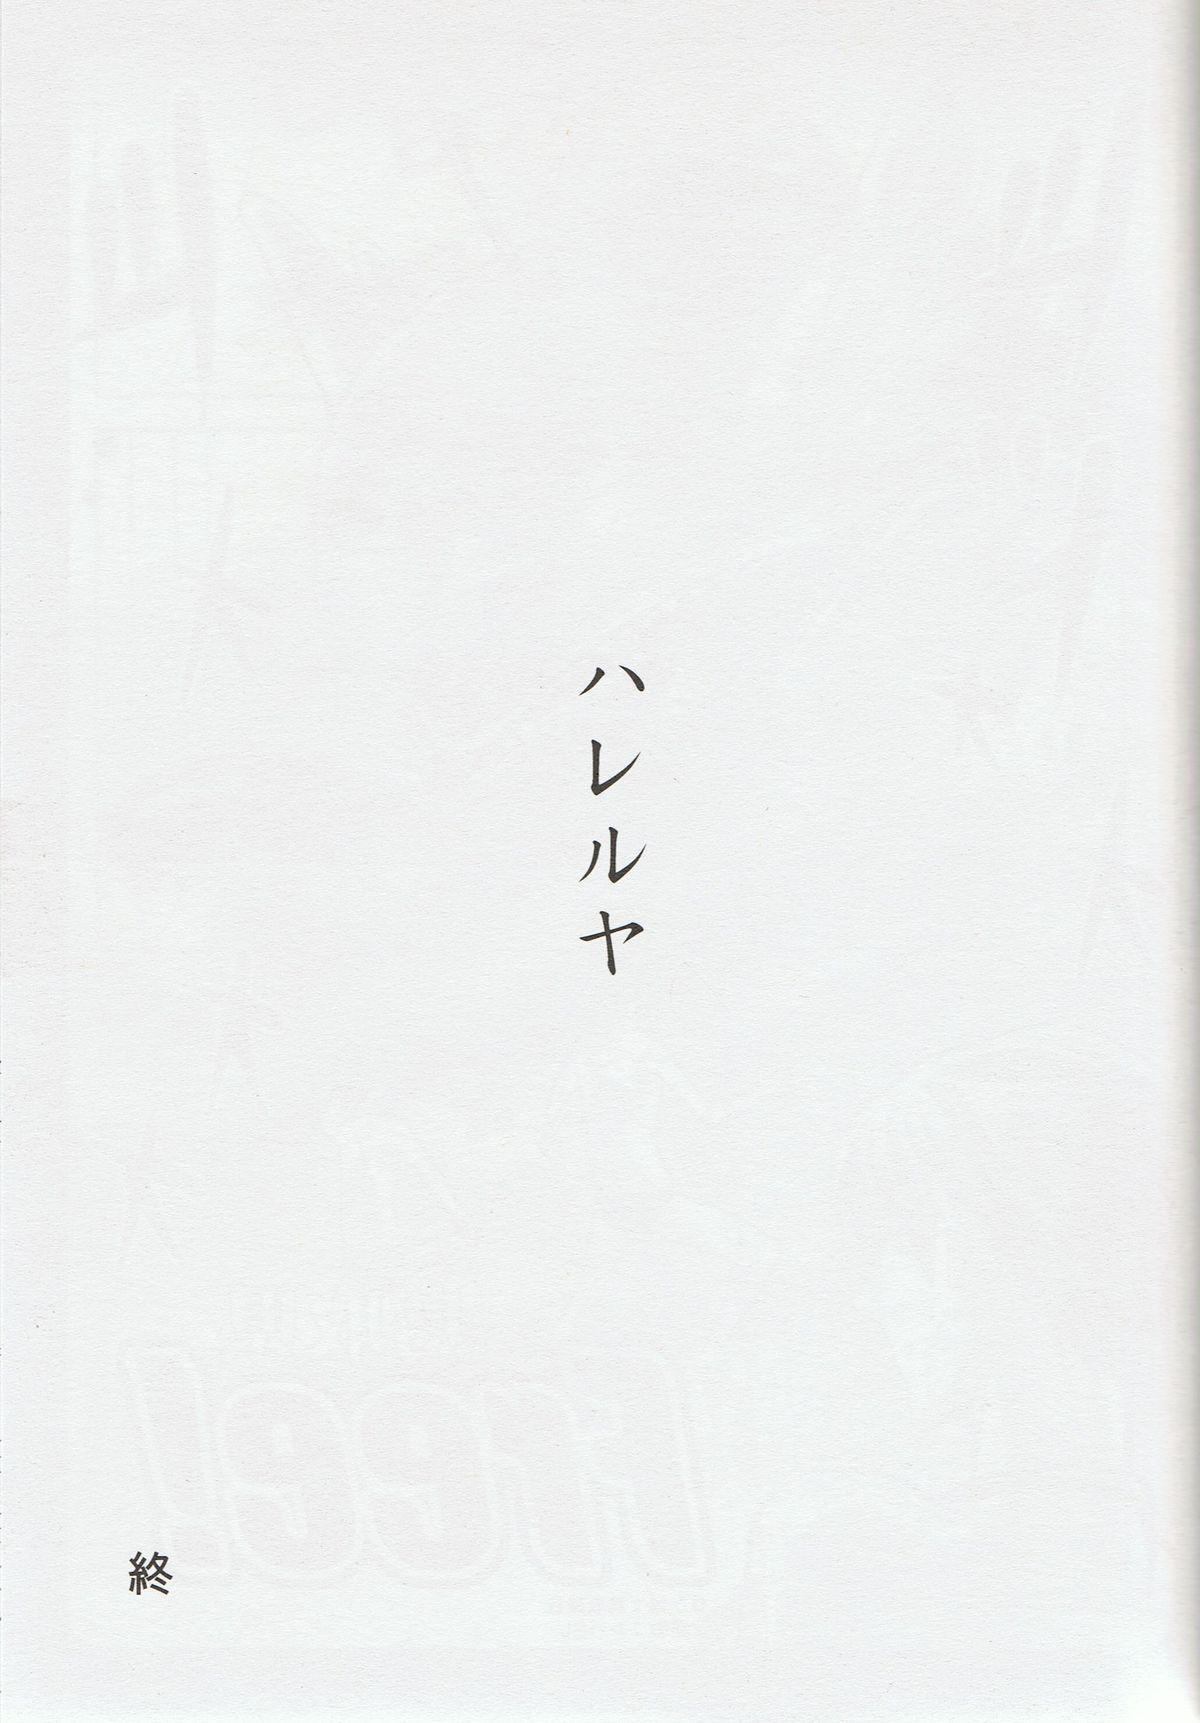 Sou da, Tottori Sakyuu Ikou. 21